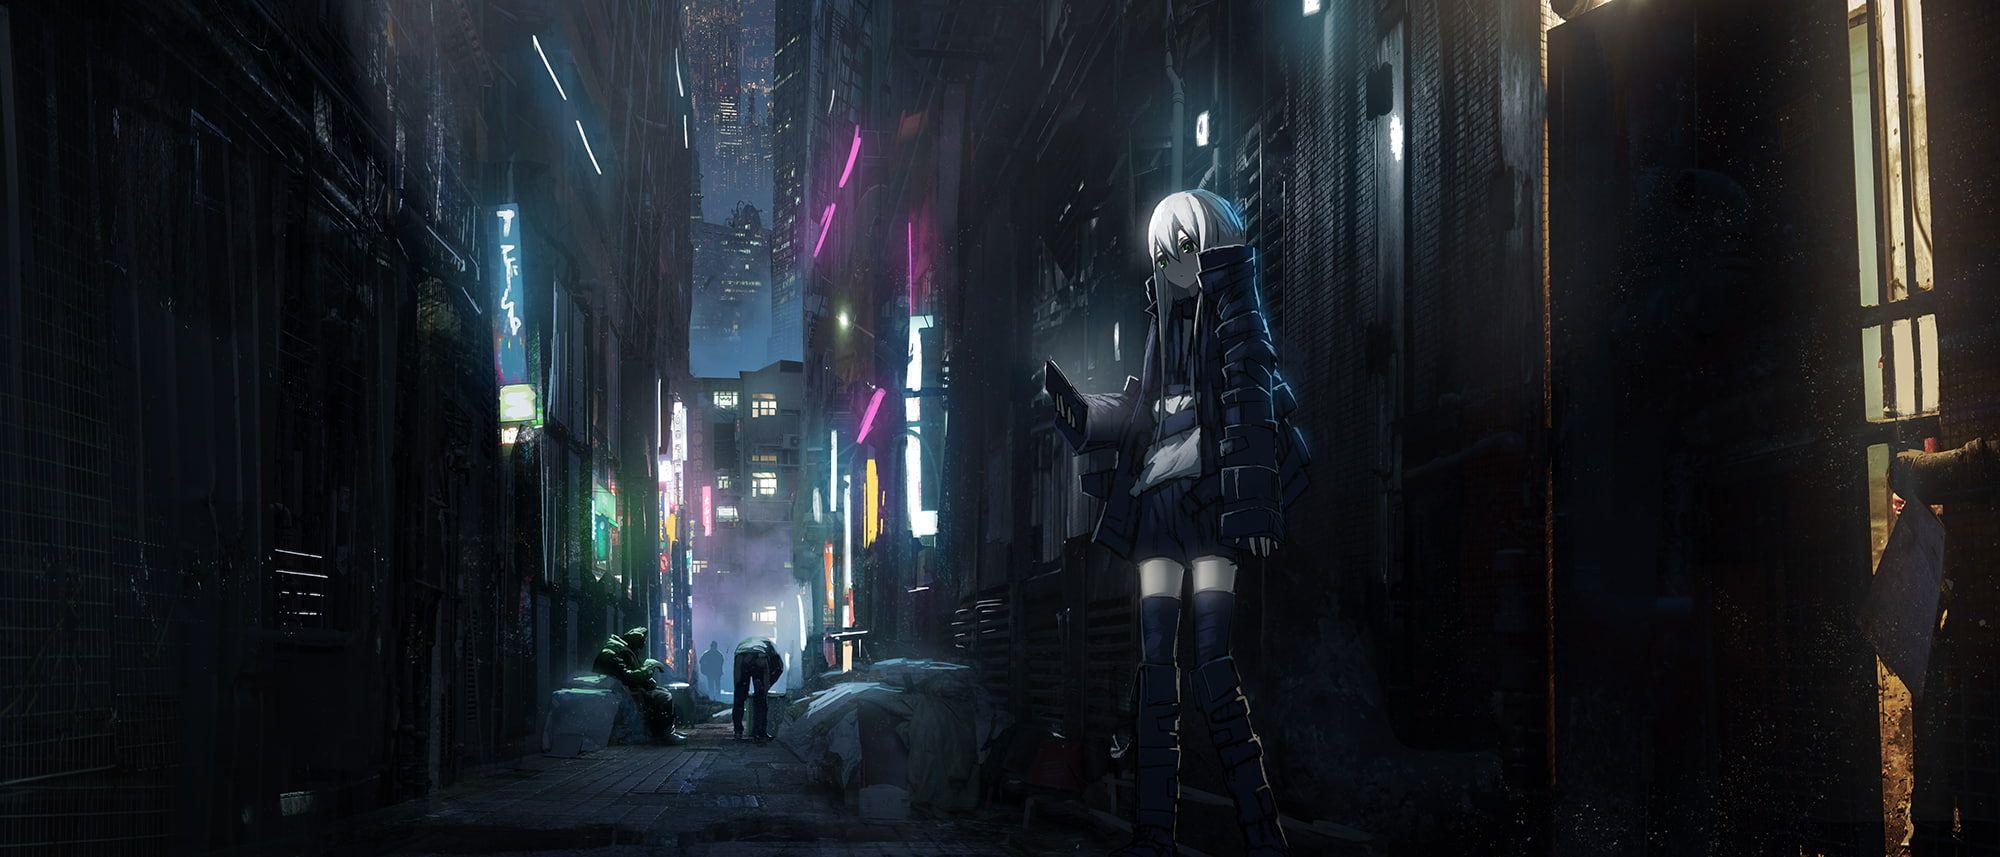 Anime Girls Anime Dark City Cyberpunk Neotokyo 1080p Wallpaper Hdwallpaper Desktop In 2020 Dark City Cyberpunk City Fantasy City